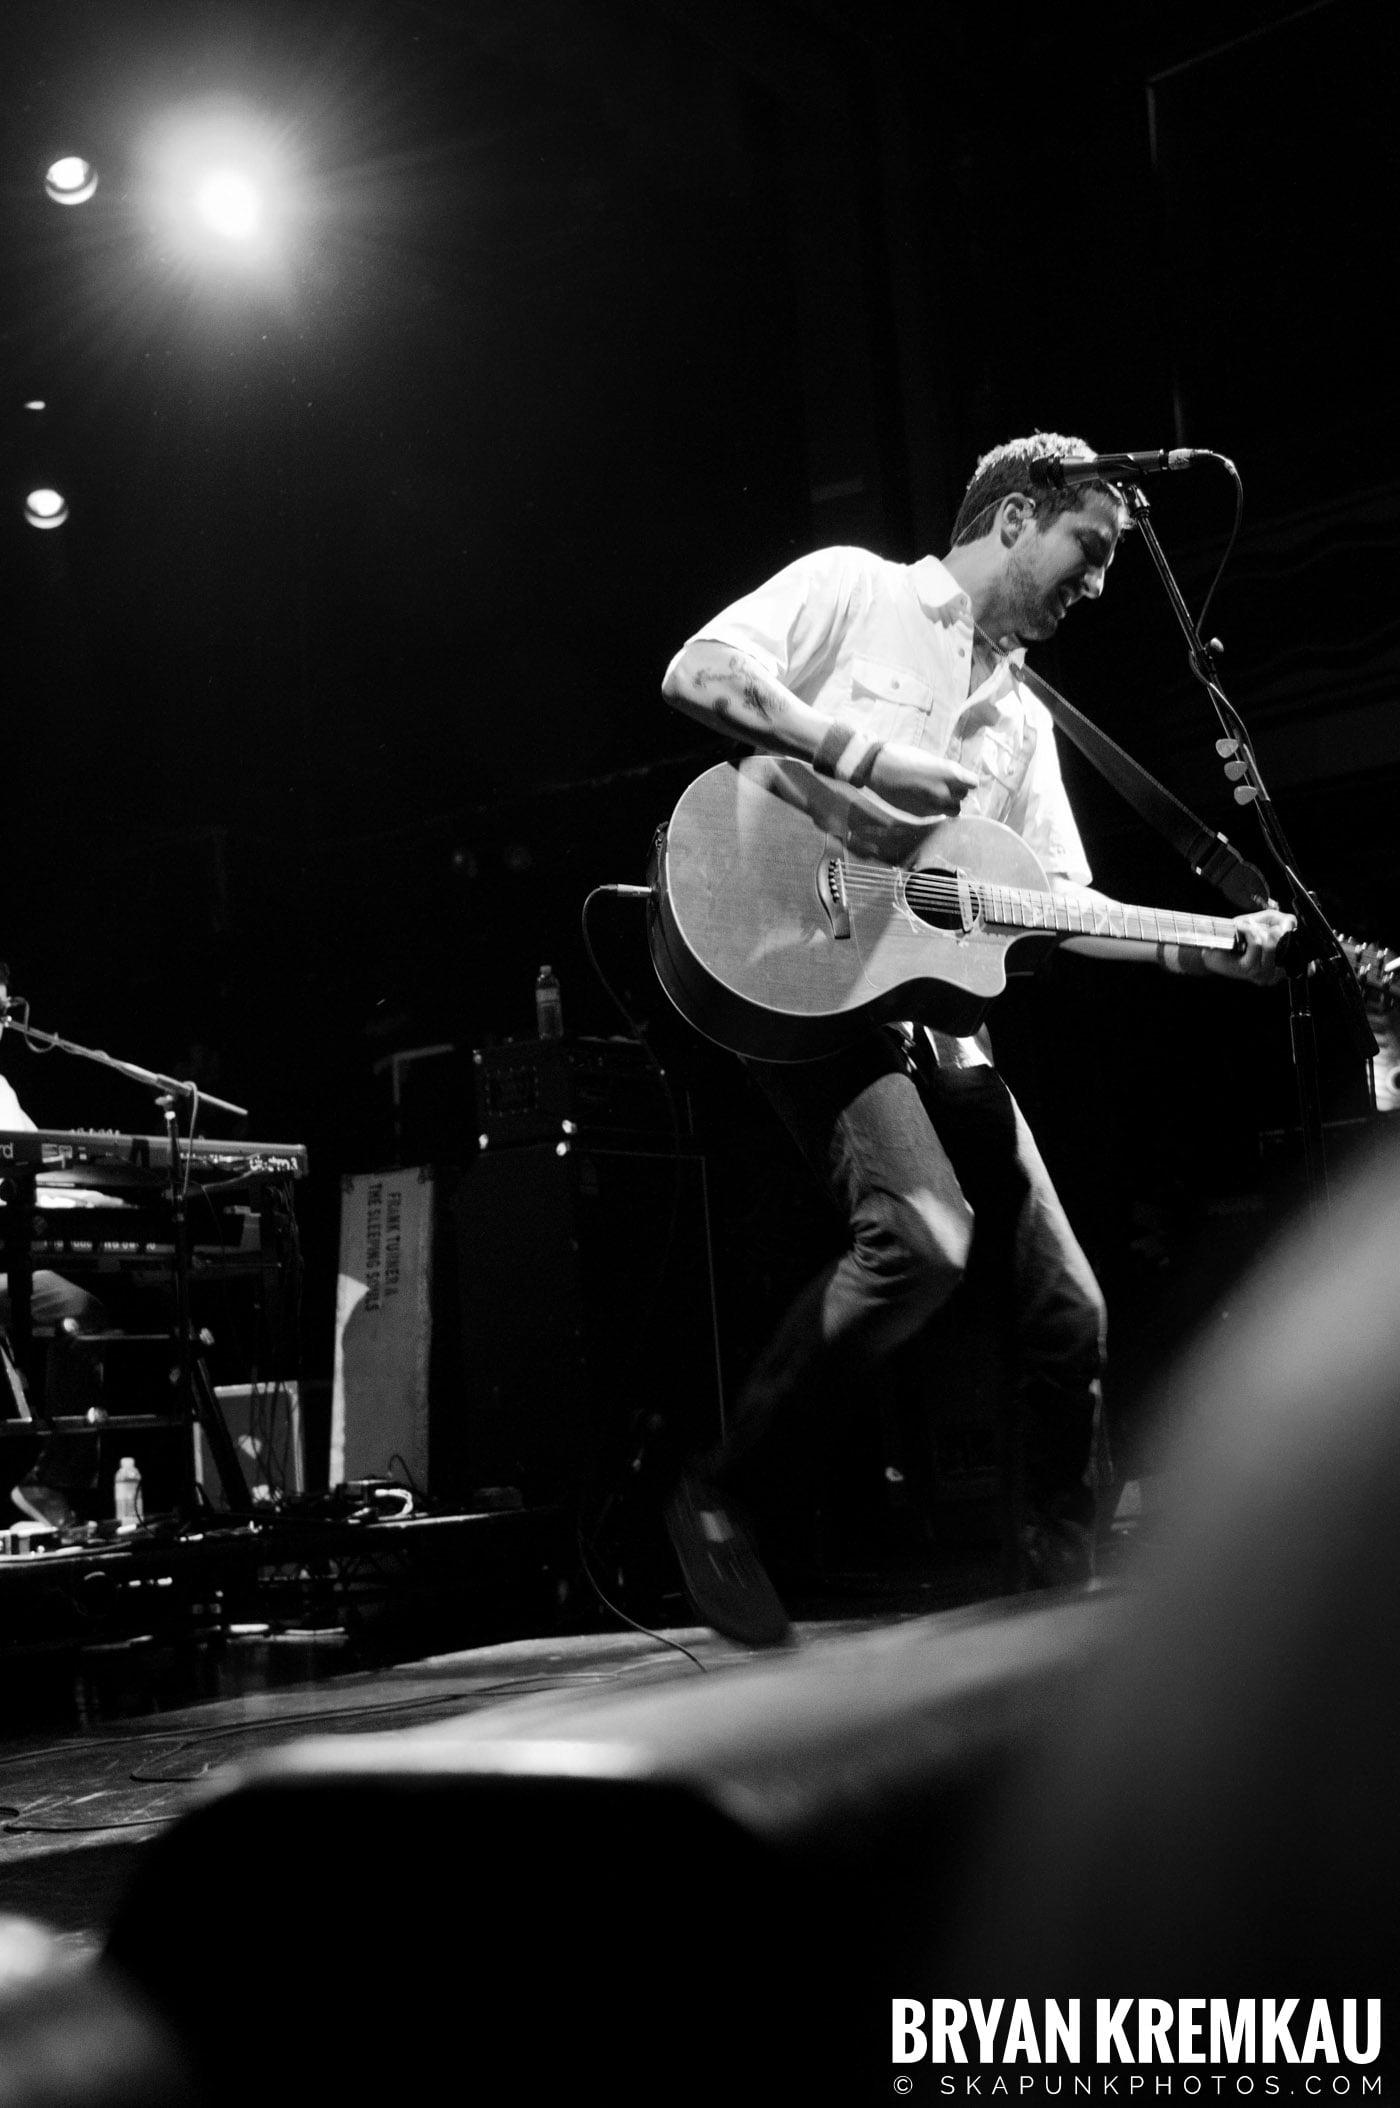 Frank Turner & The Sleeping Souls @ Webster Hall, NYC - 9.29.12 (23)